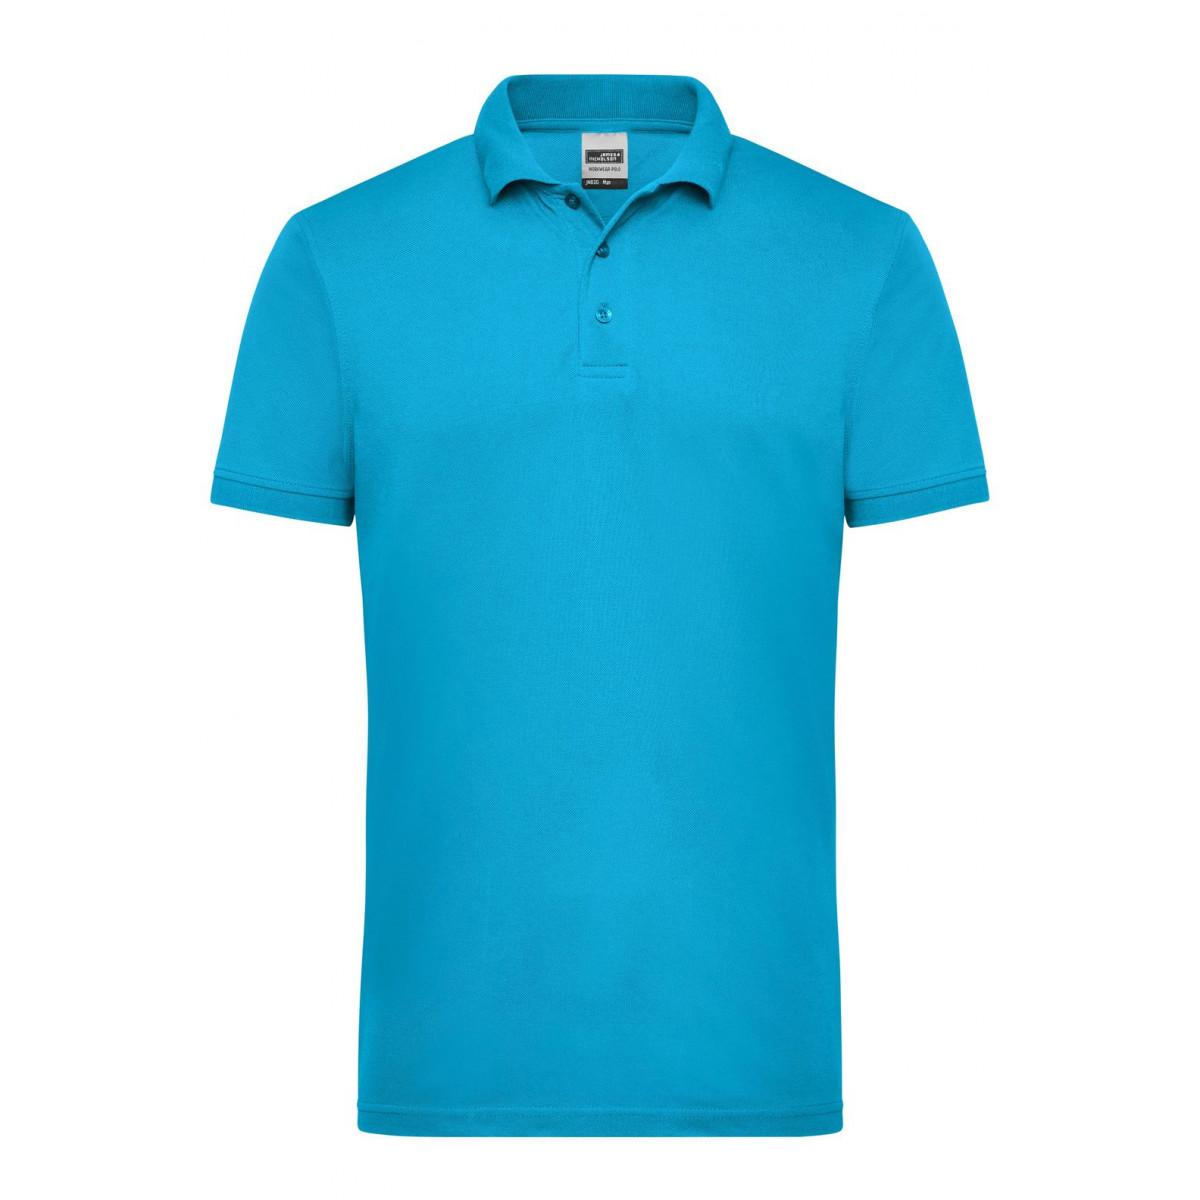 Рубашка поло мужская JN830 Mens Workwear Polo - Бирюзовый